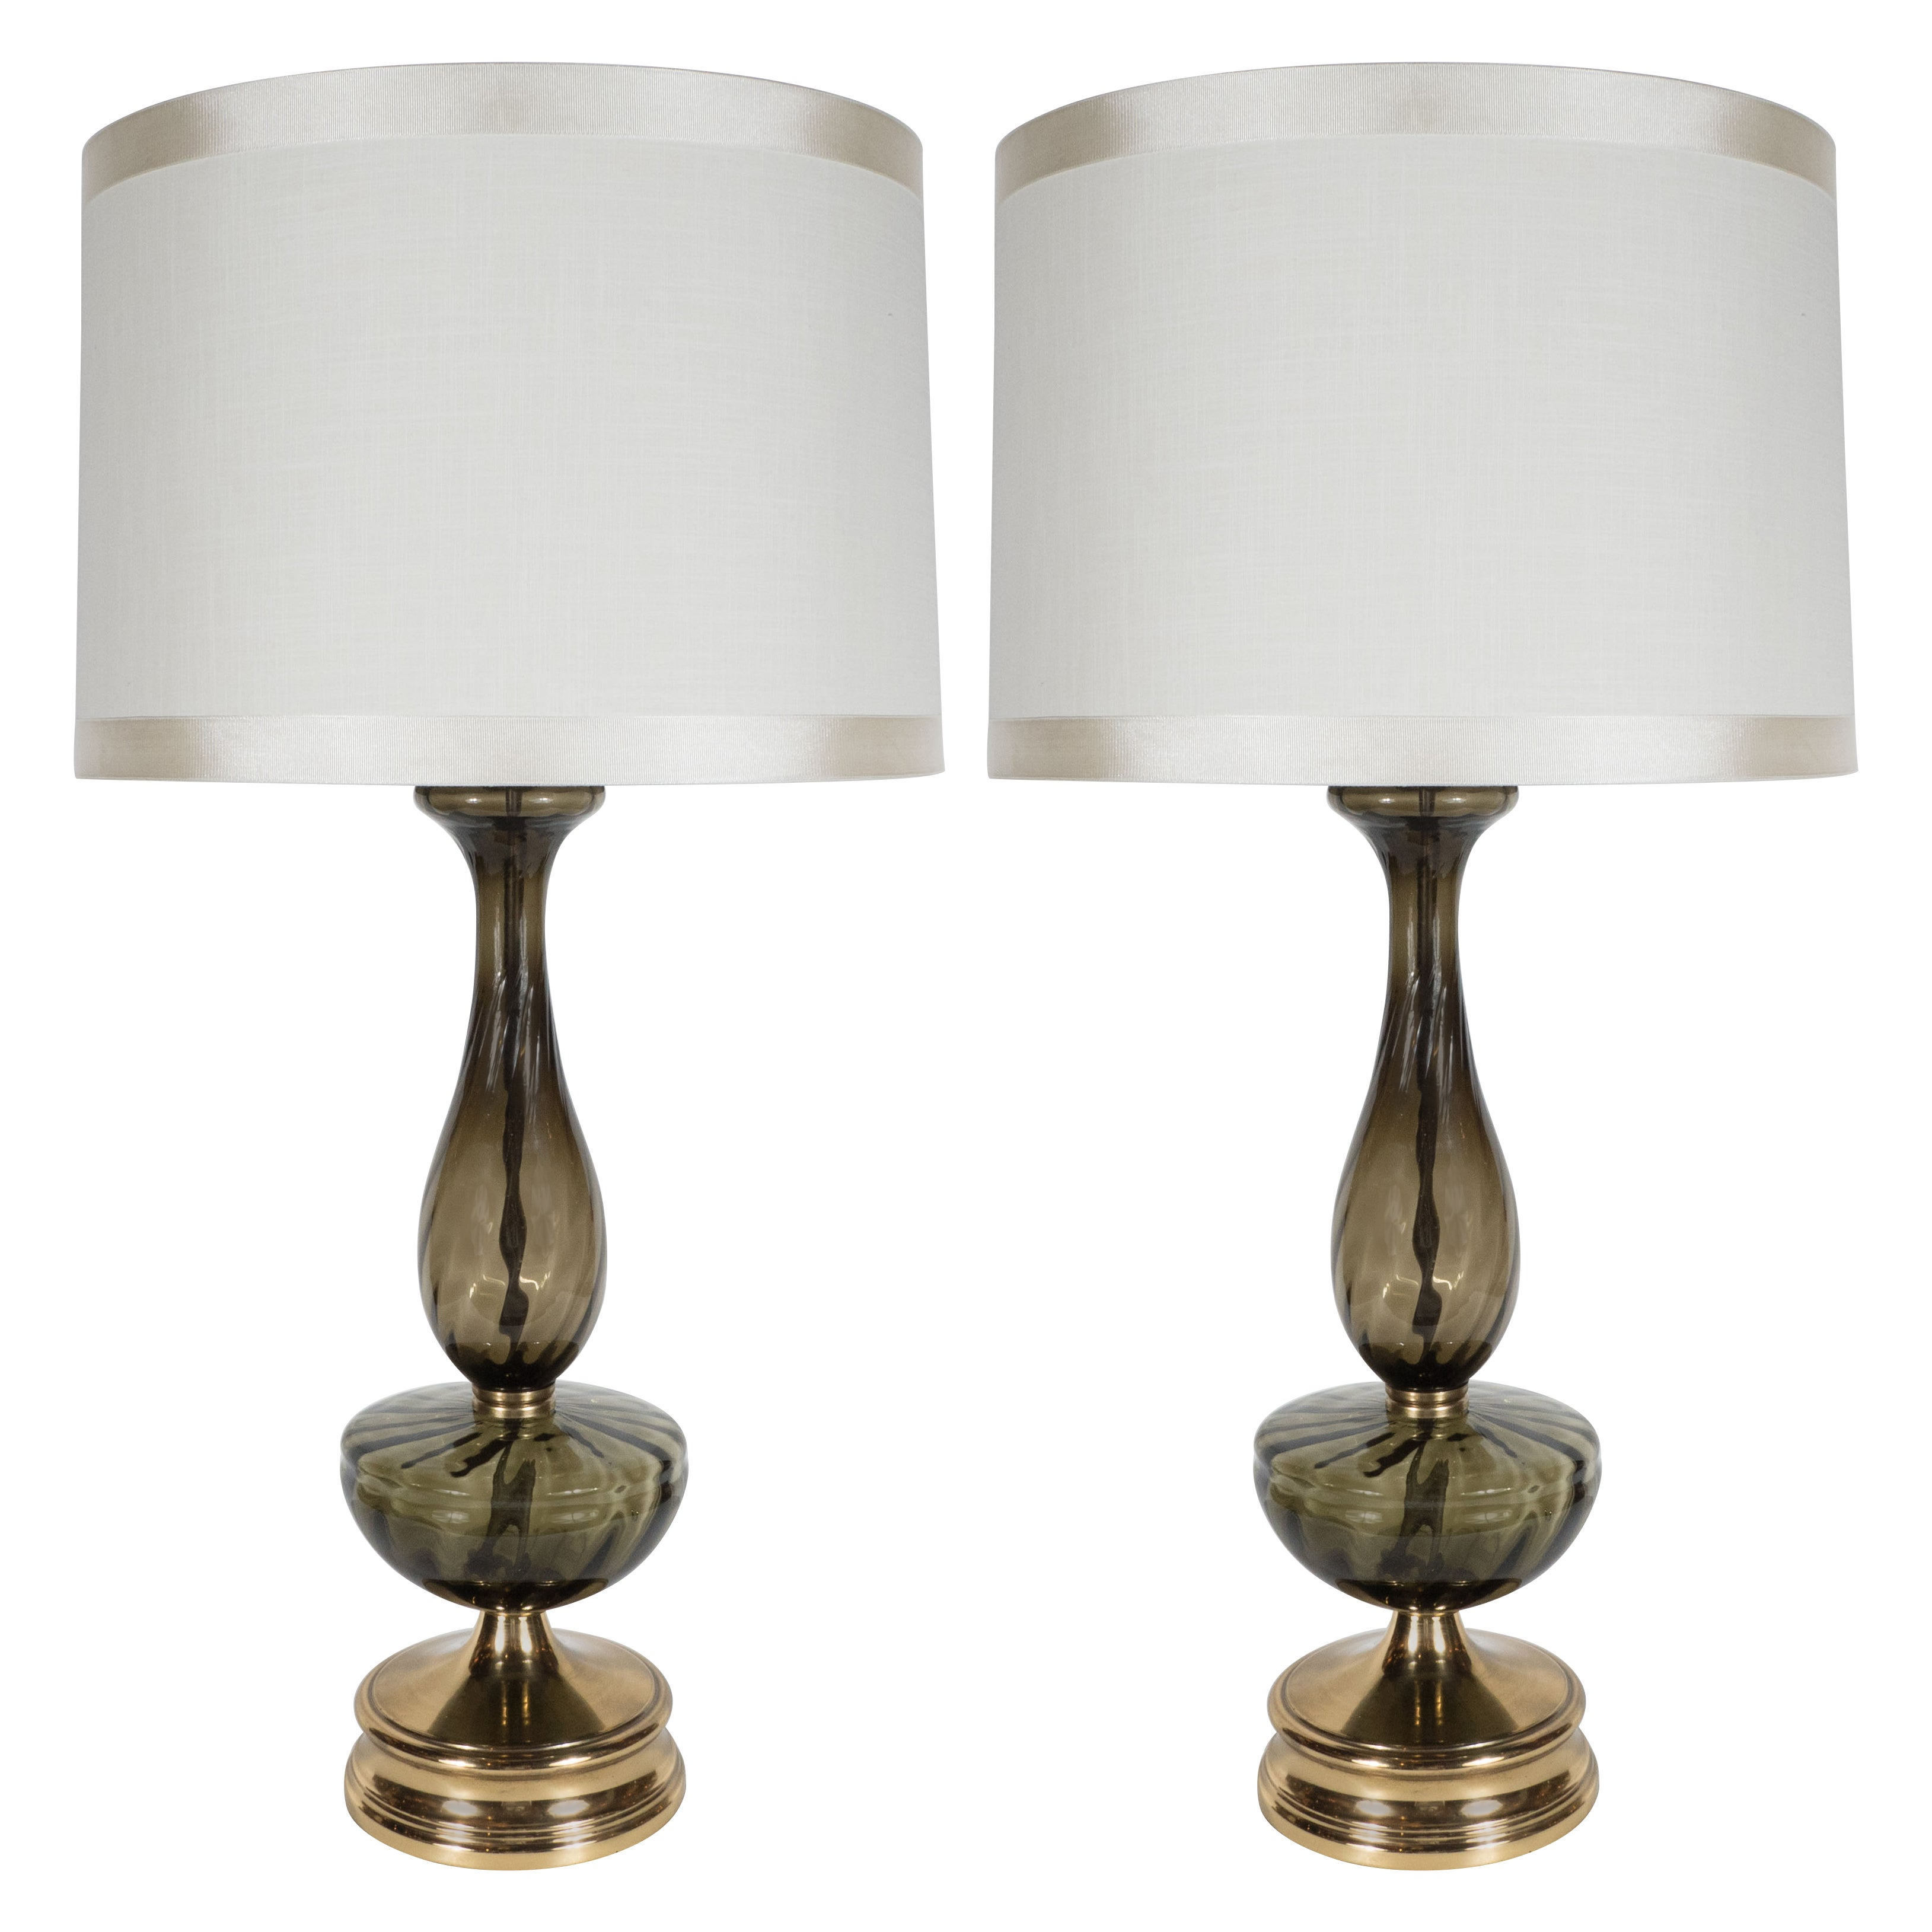 Mid-Century Modern Pair of Table Lamps in Handblown Murano Glass, circa 1960